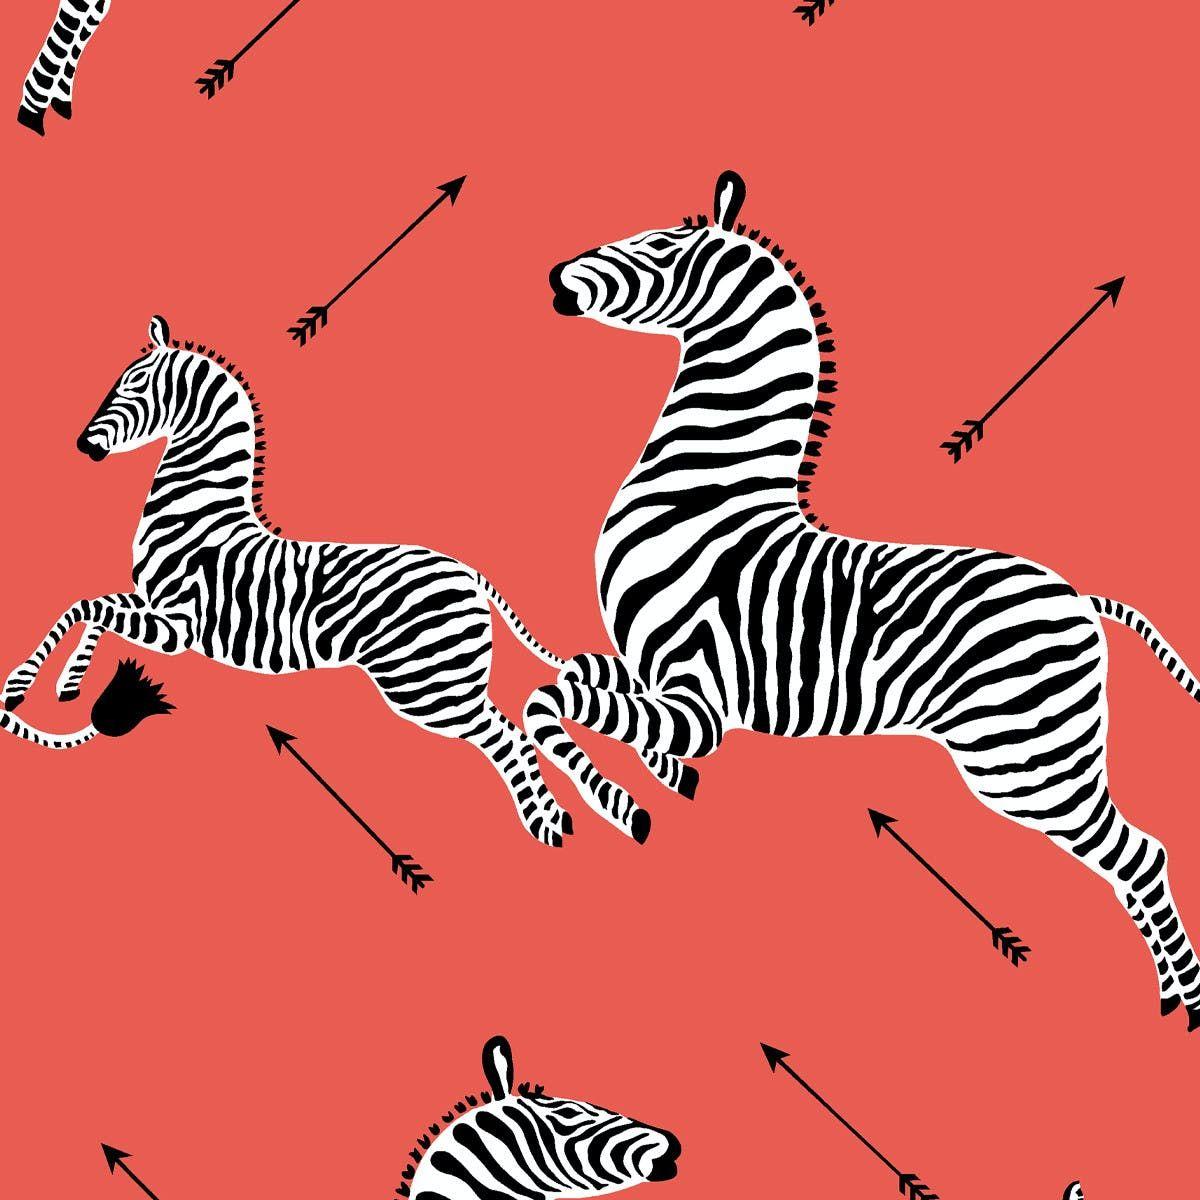 Coral Zebra Upholstered Custom Peel And Stick Wallpaper Roll In 2020 Wallpaper Roll Peel And Stick Wallpaper Zebra